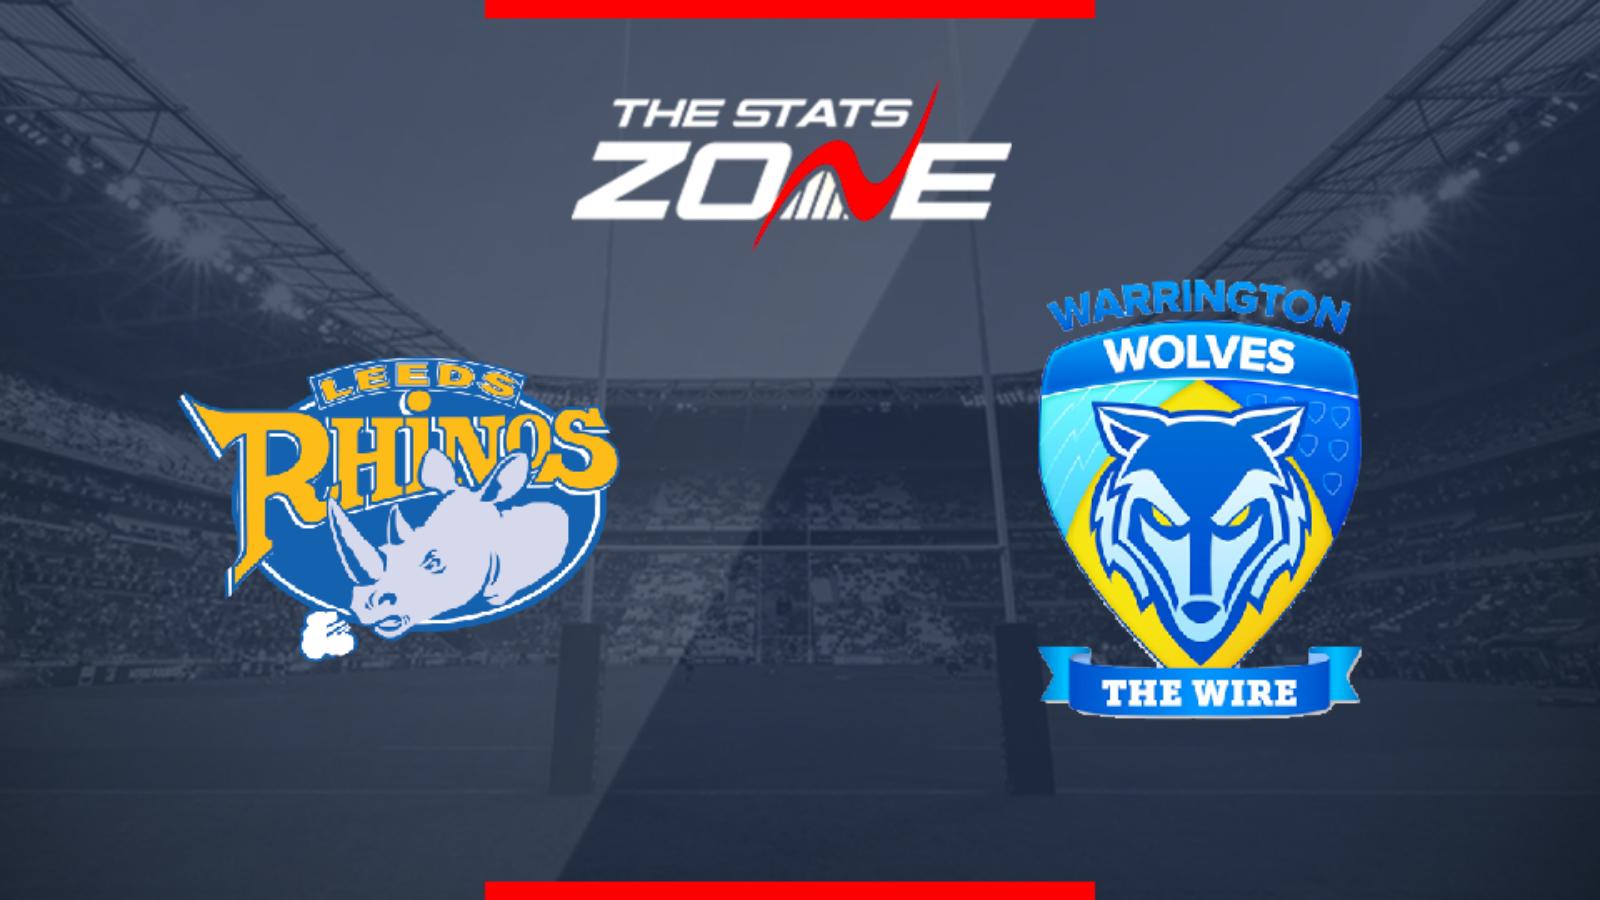 leeds rhinos v warrington wolves betting preview nfl